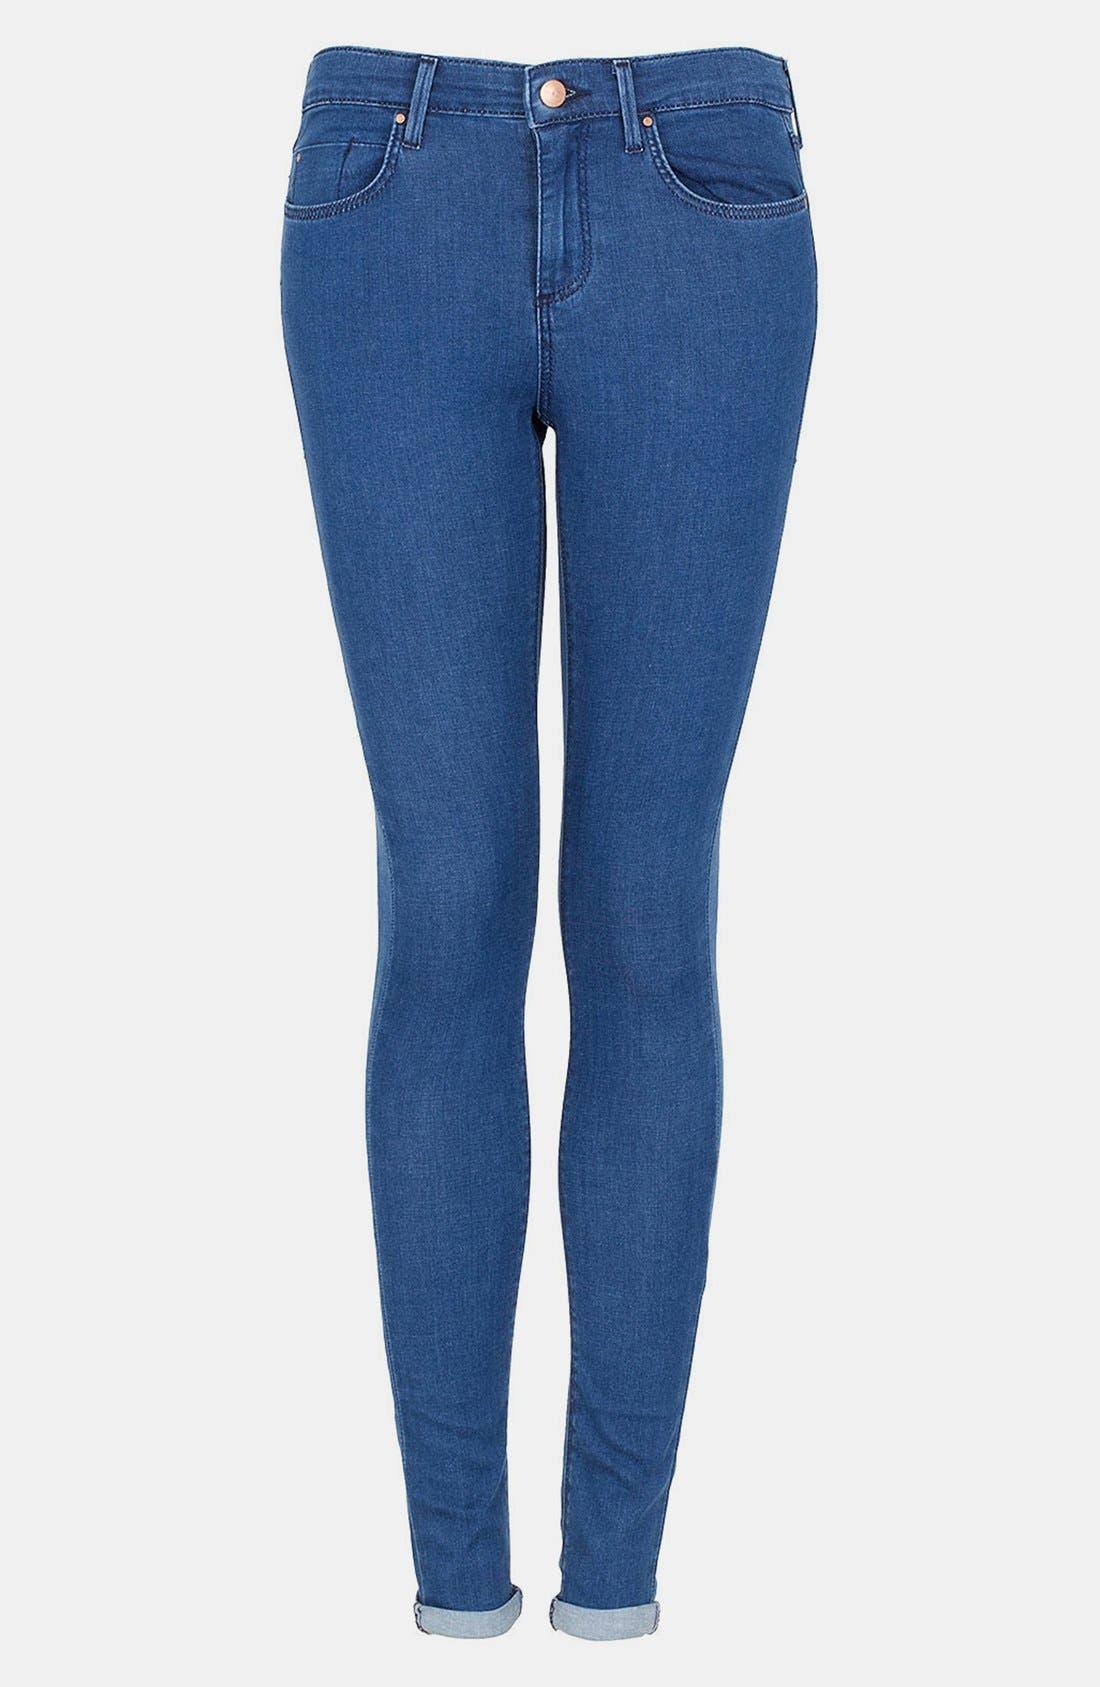 Main Image - Topshop Moto 'Leigh' Skinny Jeans (Blue) (Short)